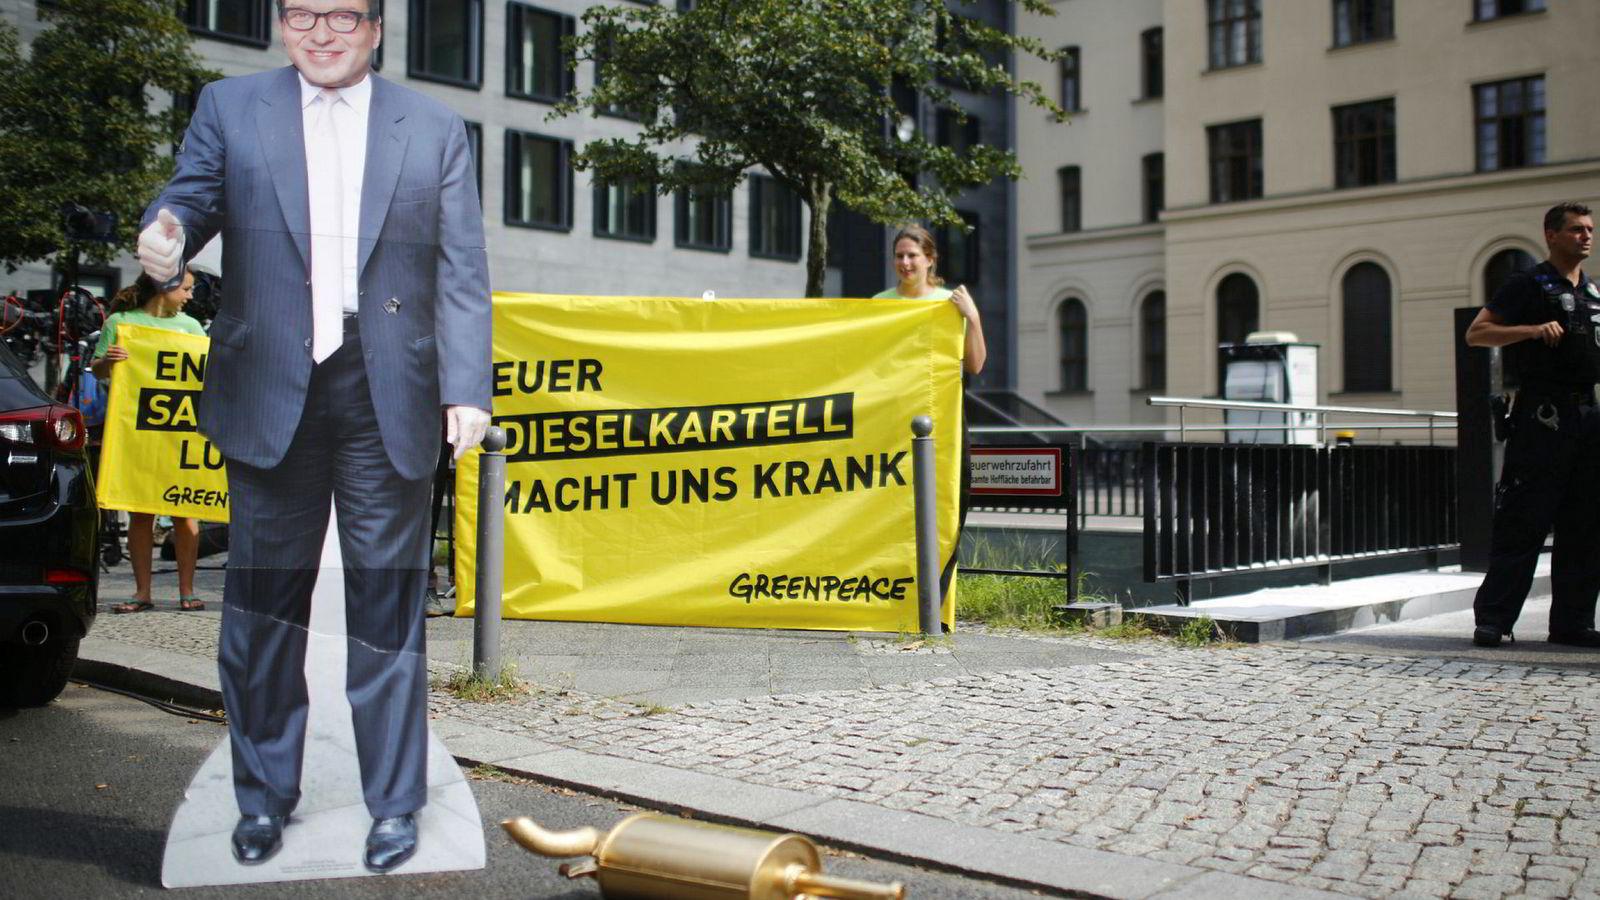 Demonstranter utenfor Tysklands føderale departement for transport og digital infrastruktur med en plakat av transportminister Alexander Dobrindt - som i dag møter Tysklands omstridte bilindustri.